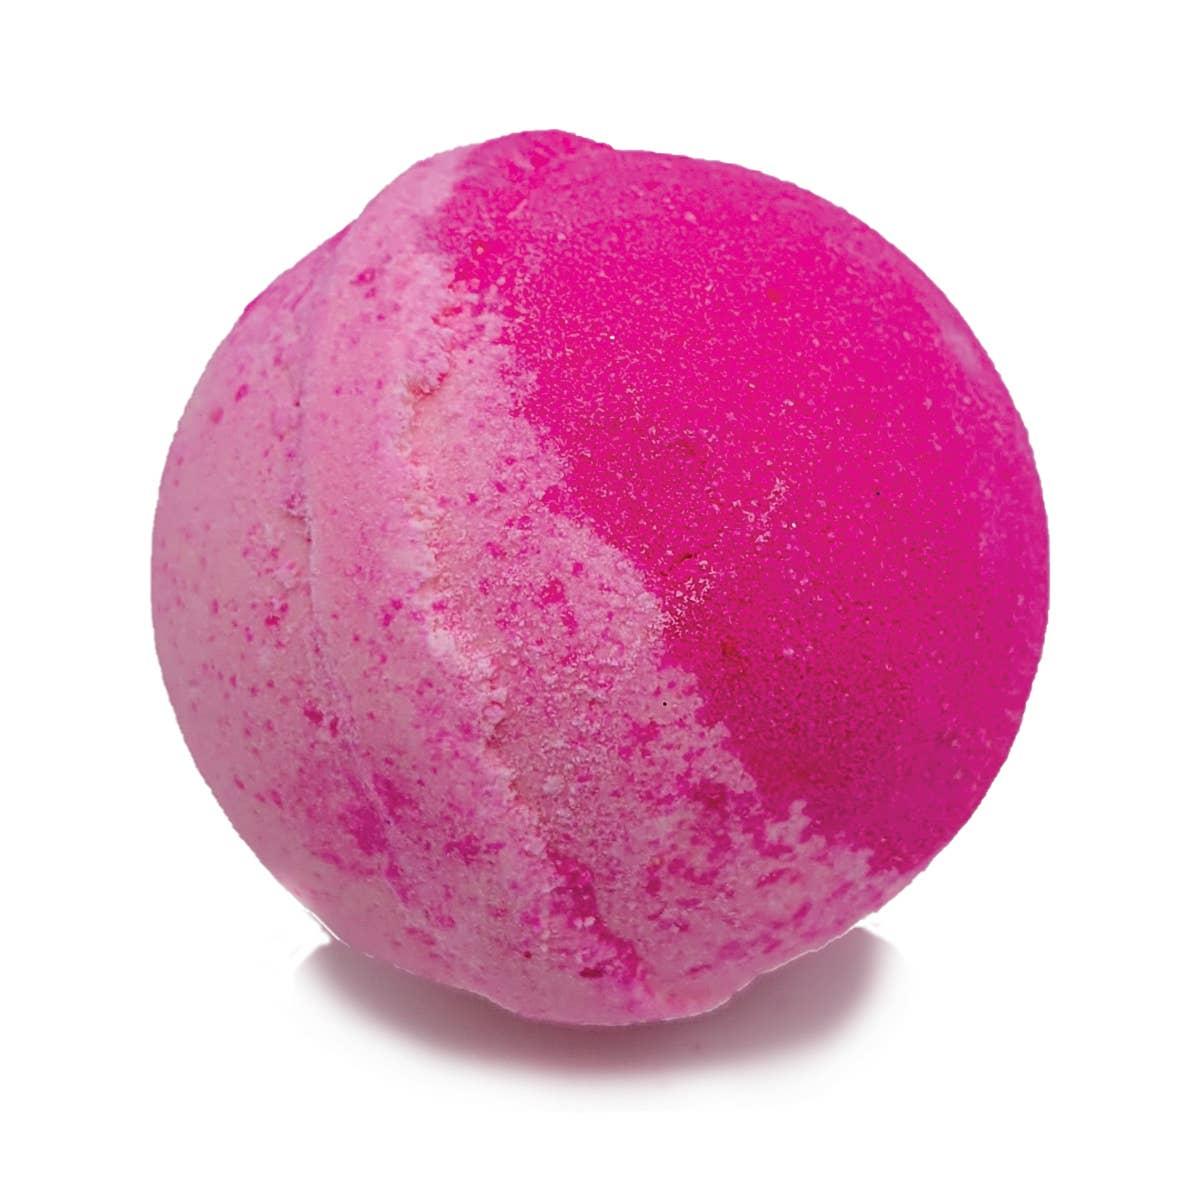 Evolve - Bath Bomb - Pearberry | Trada Marketplace